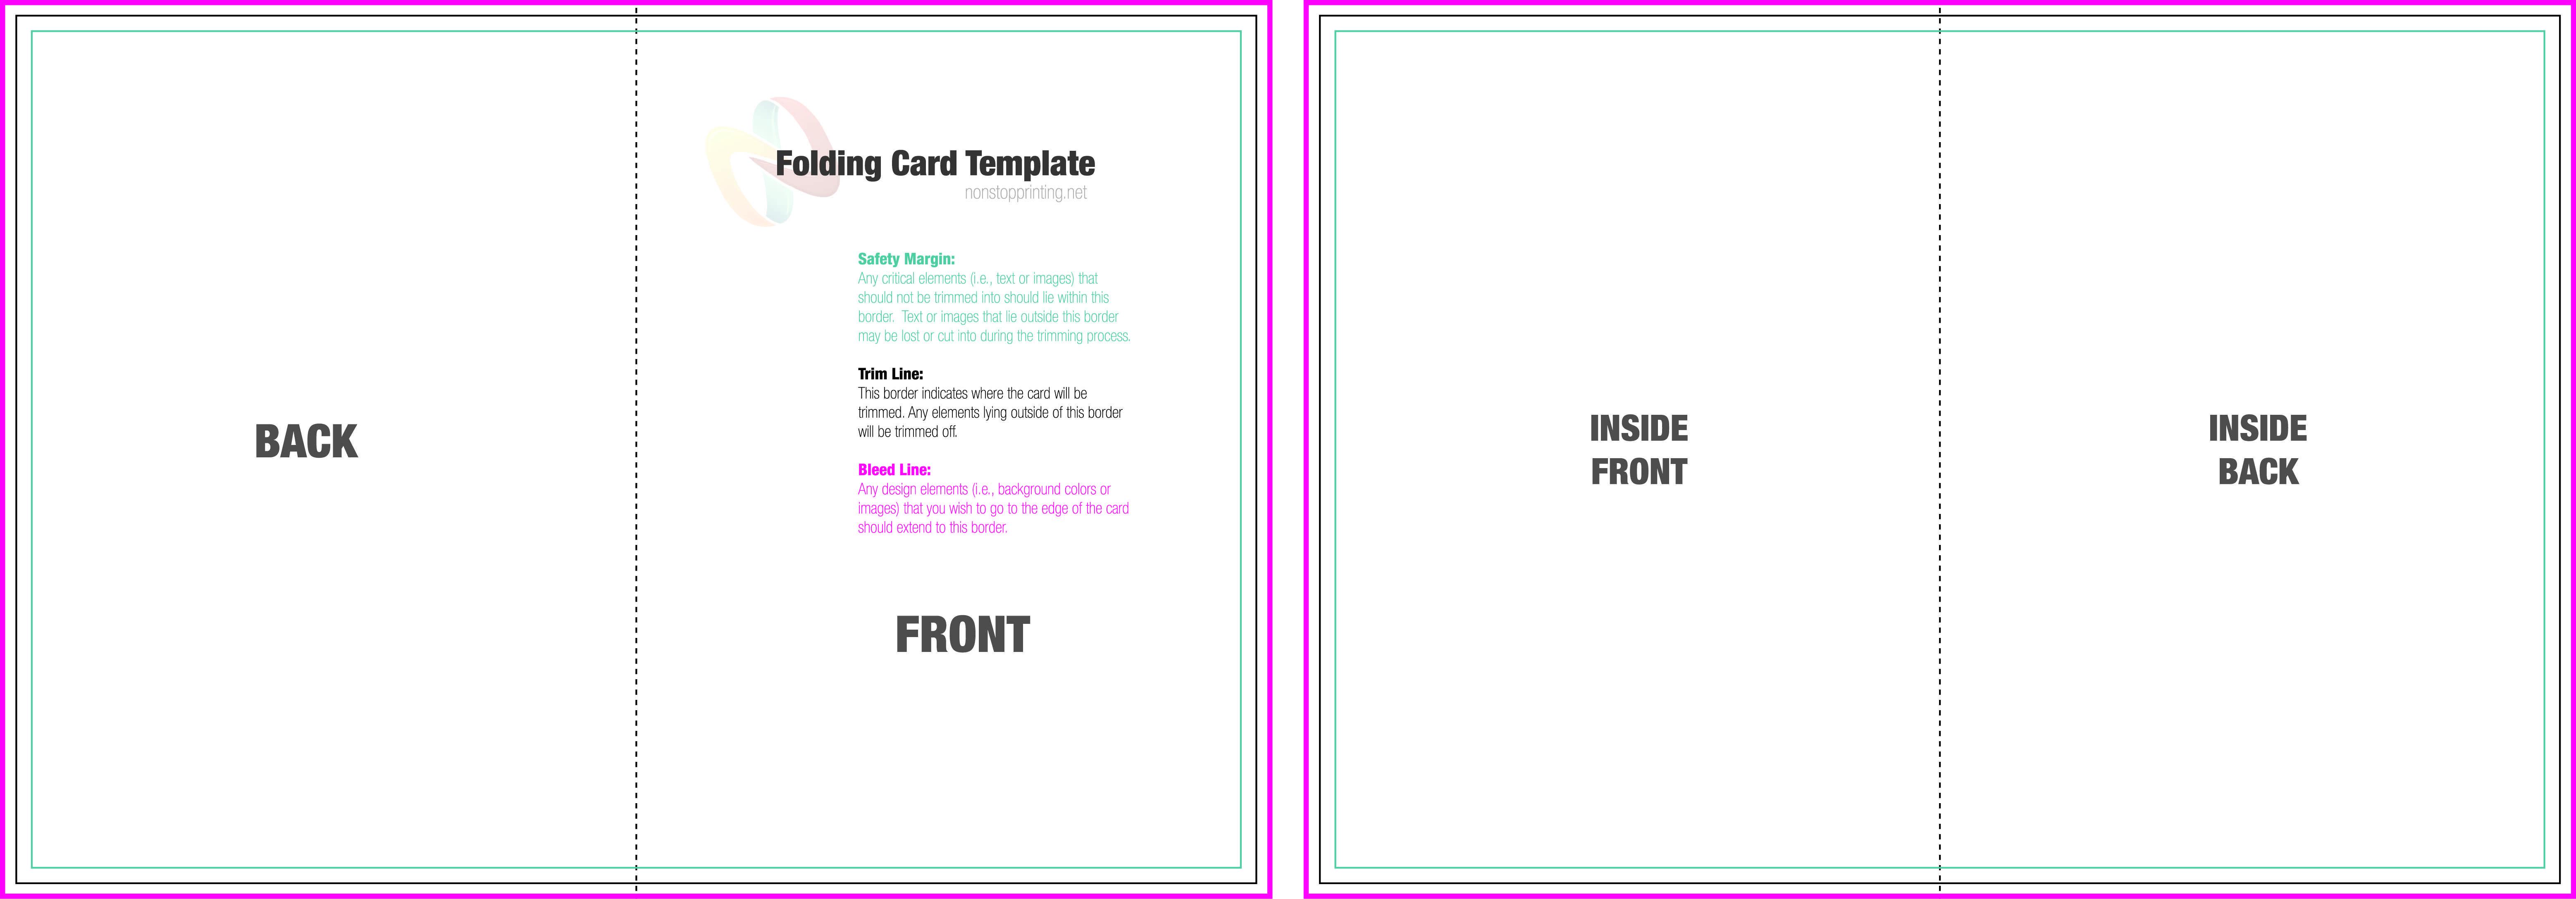 2 Fold Card Template - Cards Design Templates